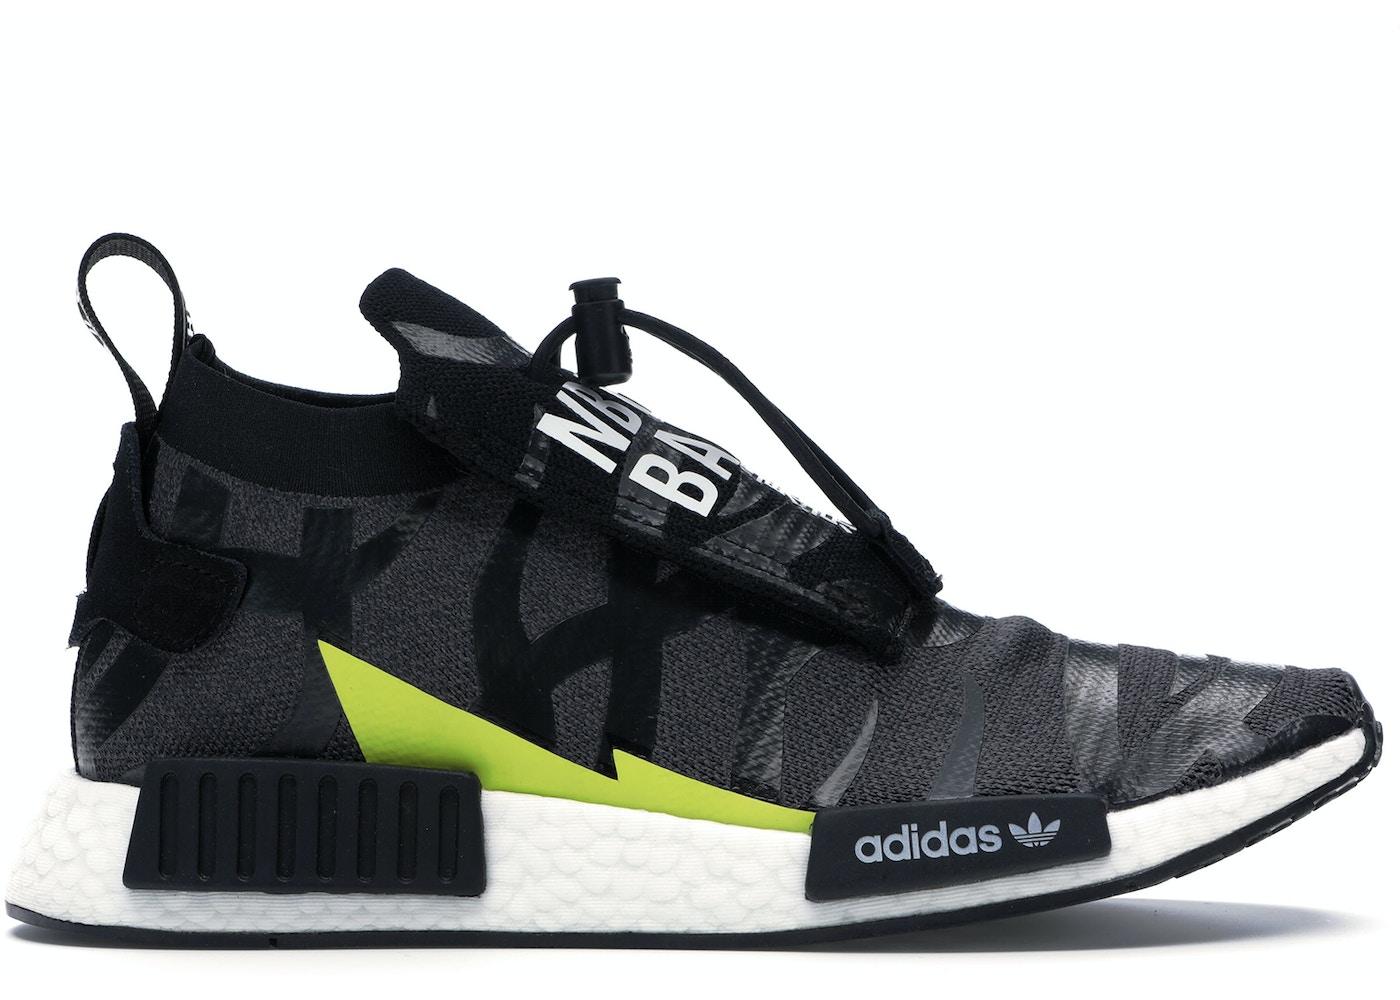 finest selection 5c0cd e6567 adidas NMD TS1 Bape x Neighborhood